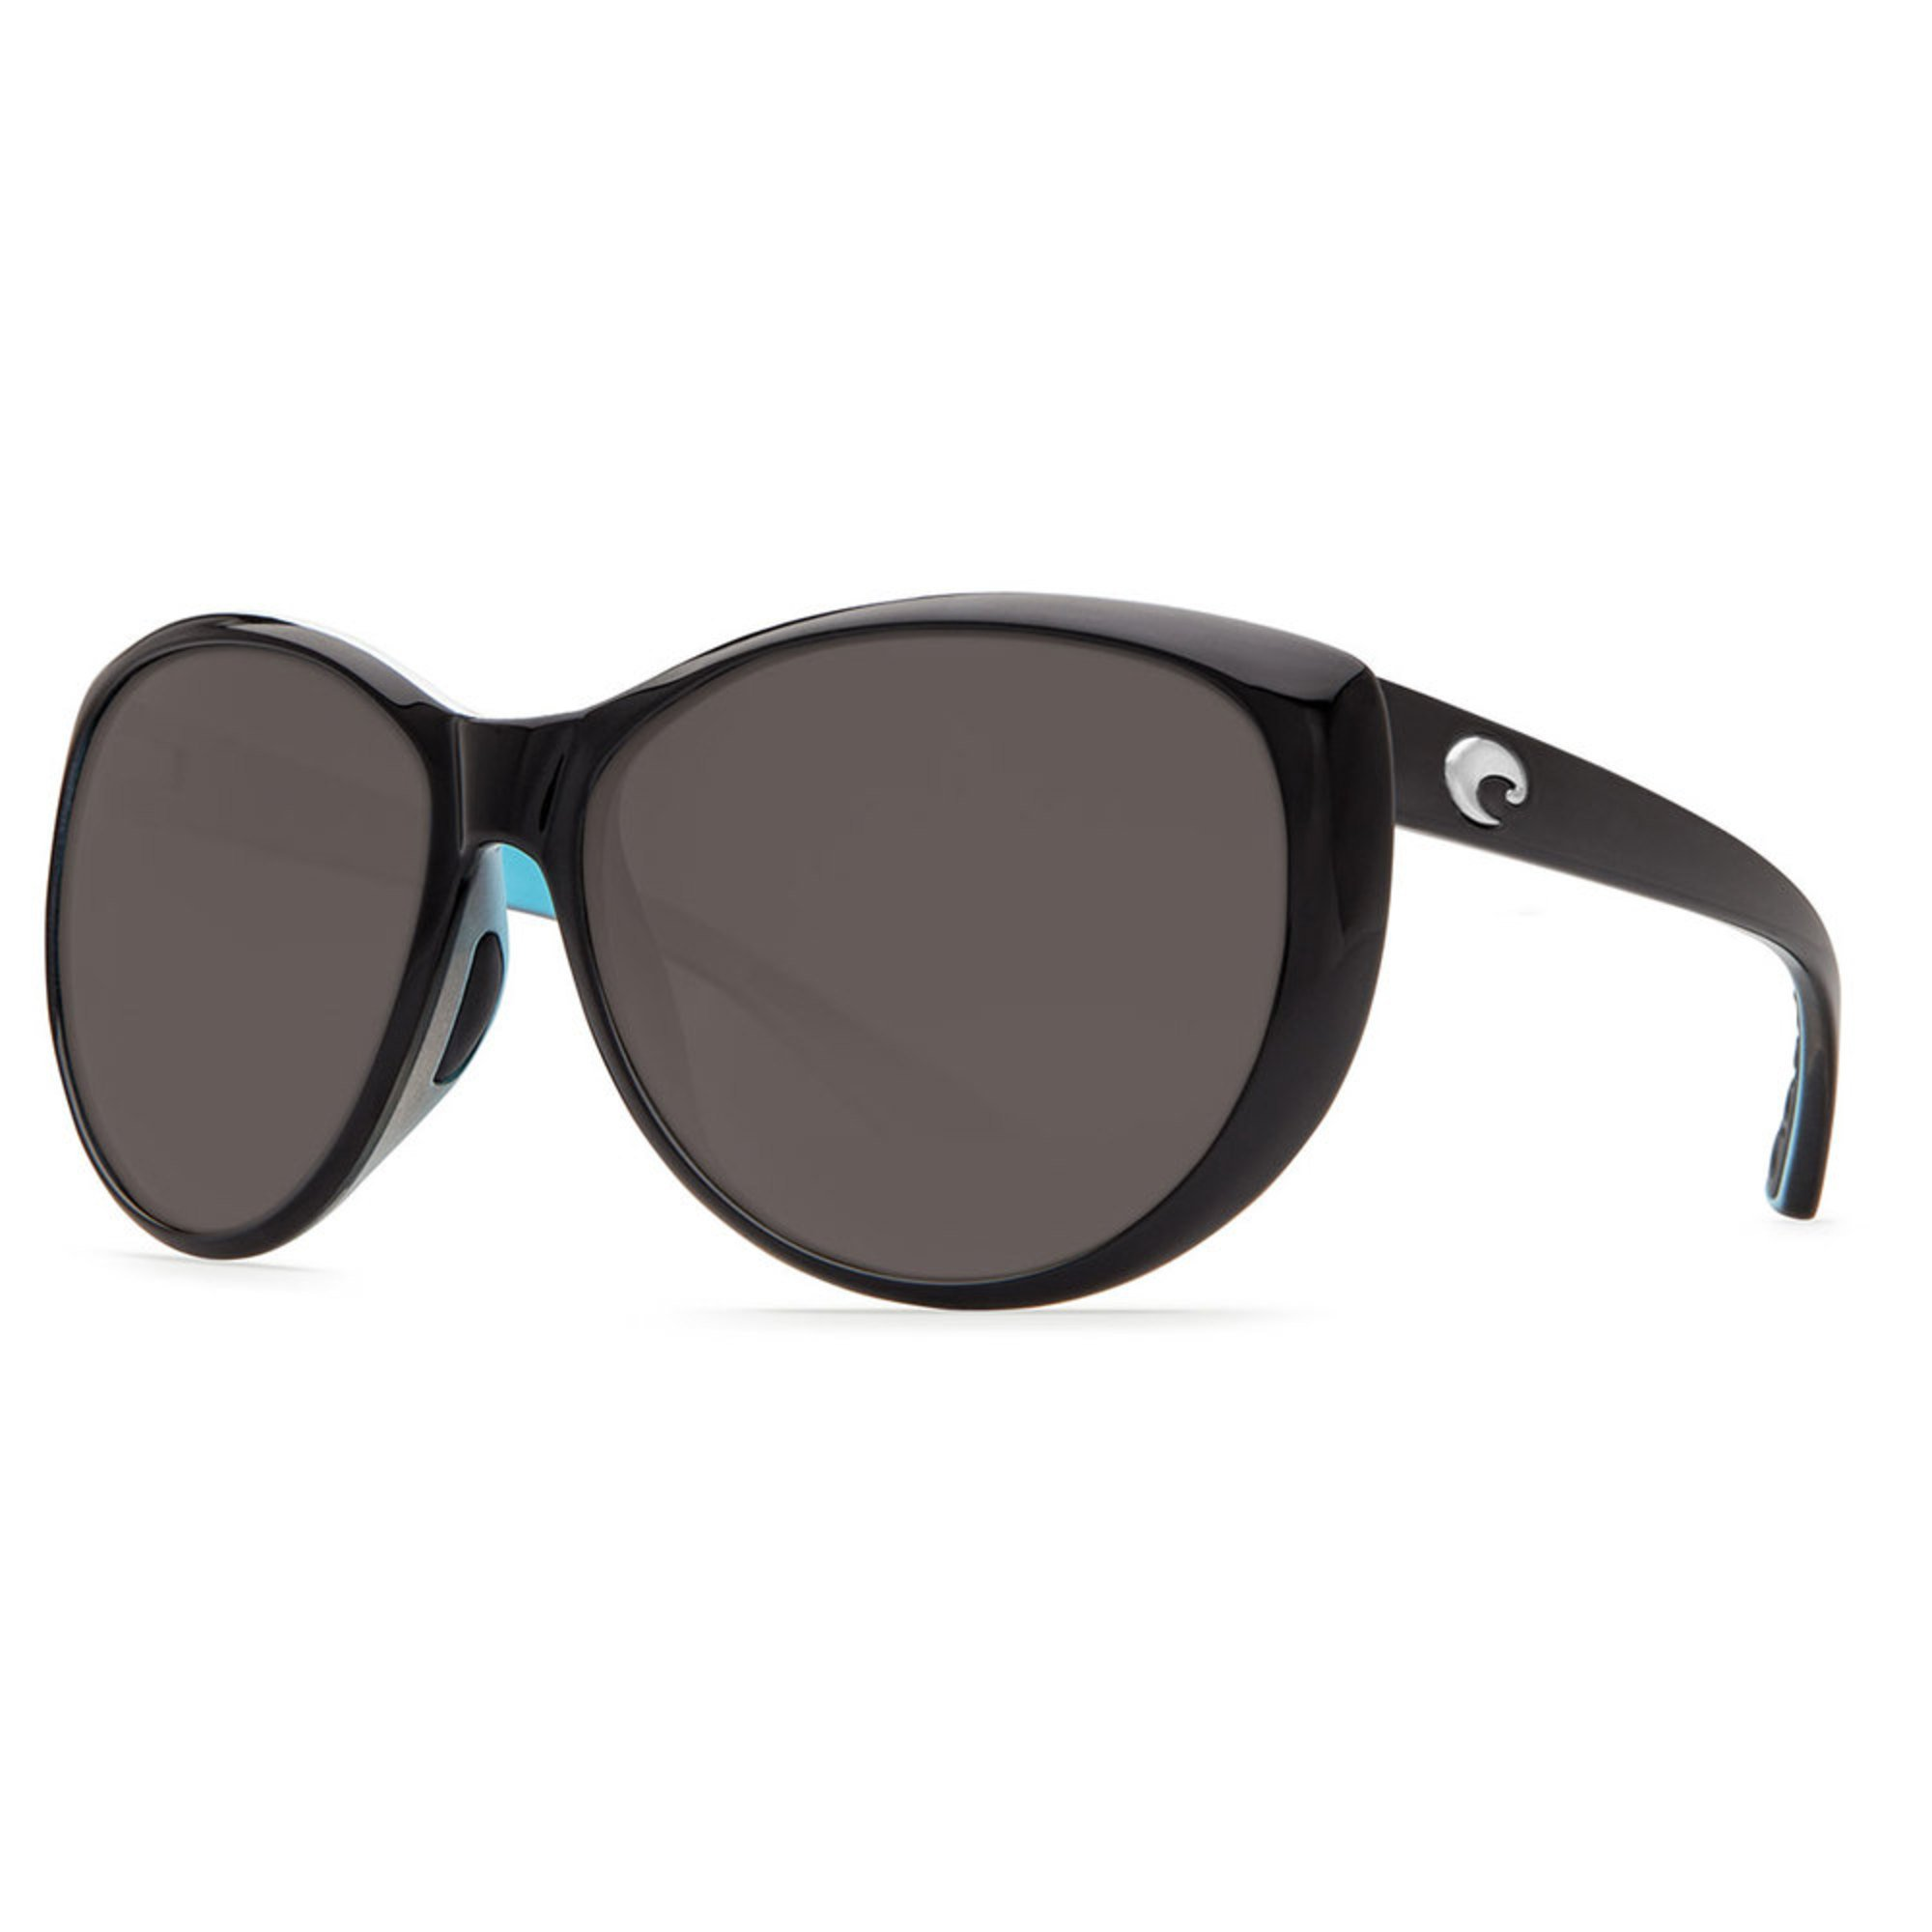 65bed12e8a2a8 Costa del Mar. Costa Del Mar Women s Polarized Lamar Sunglasses